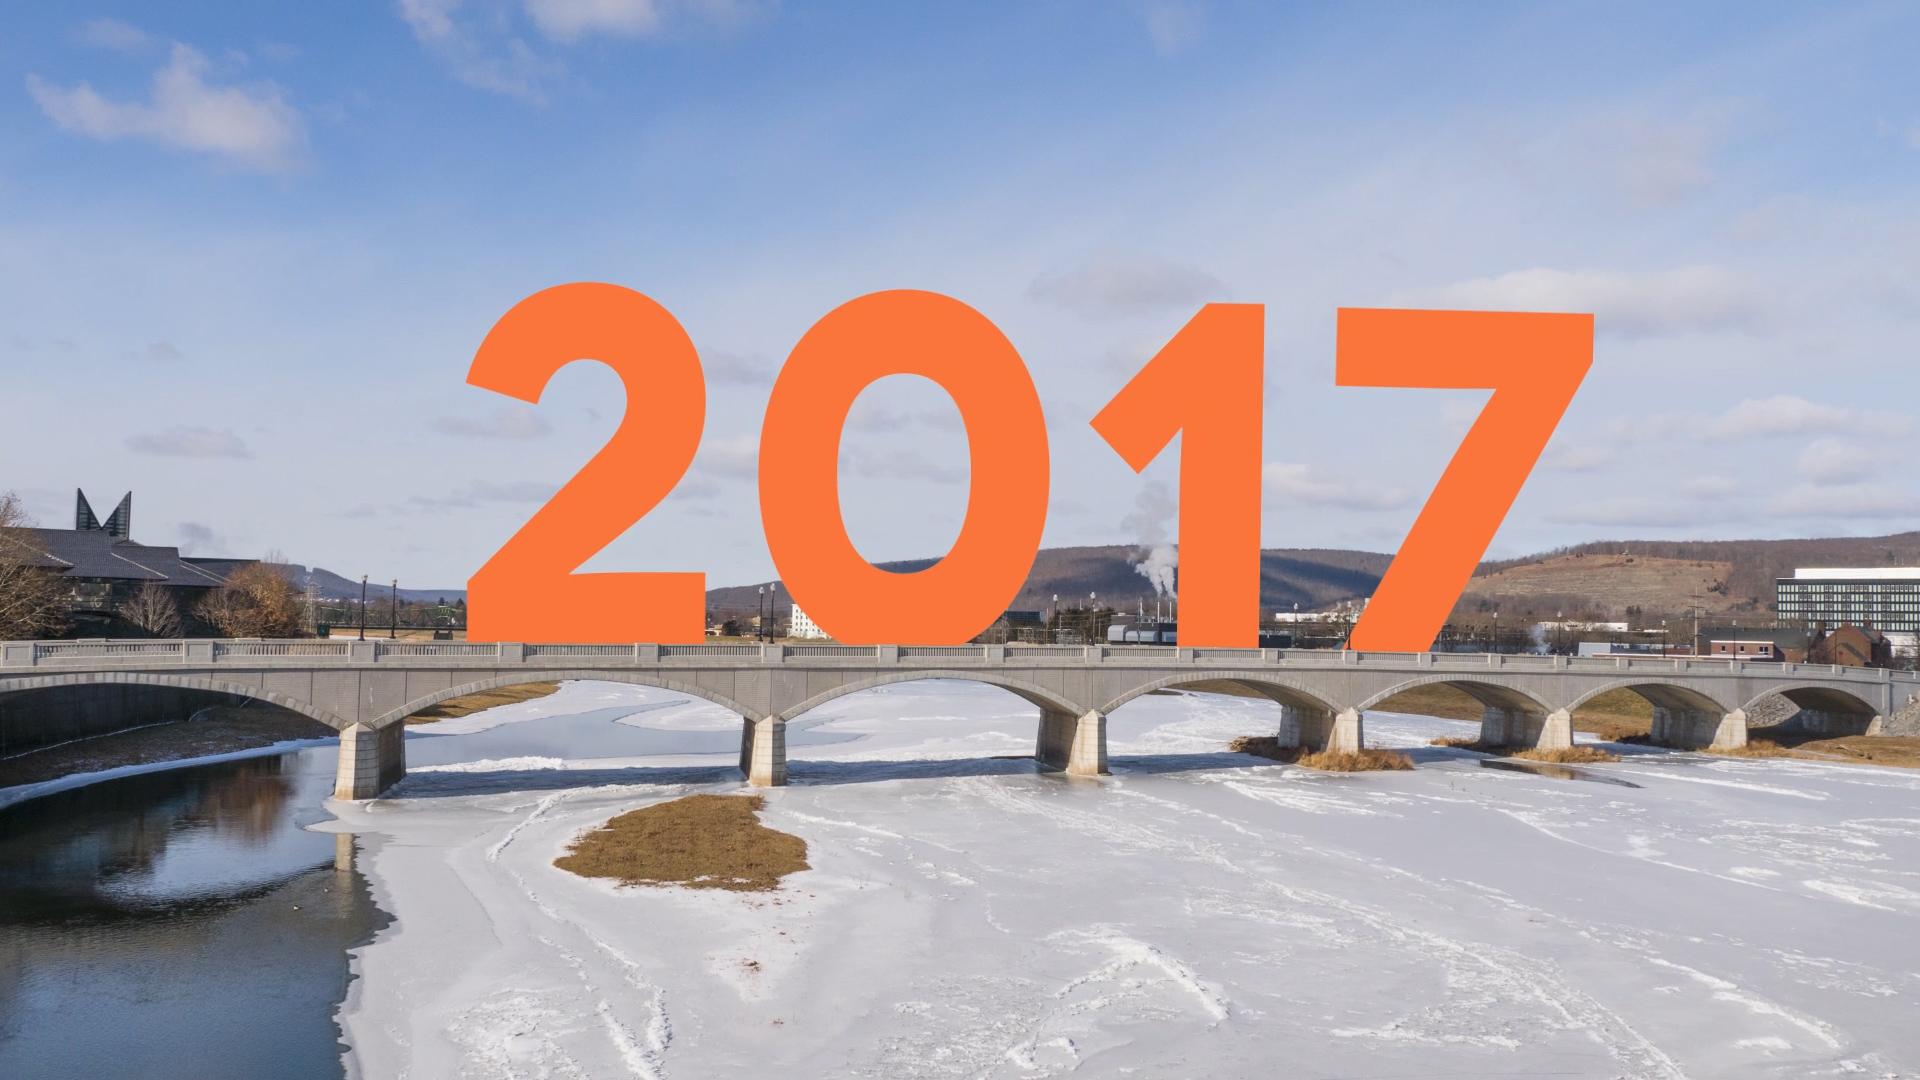 Urban Corning's Top 5 Posts of 2017